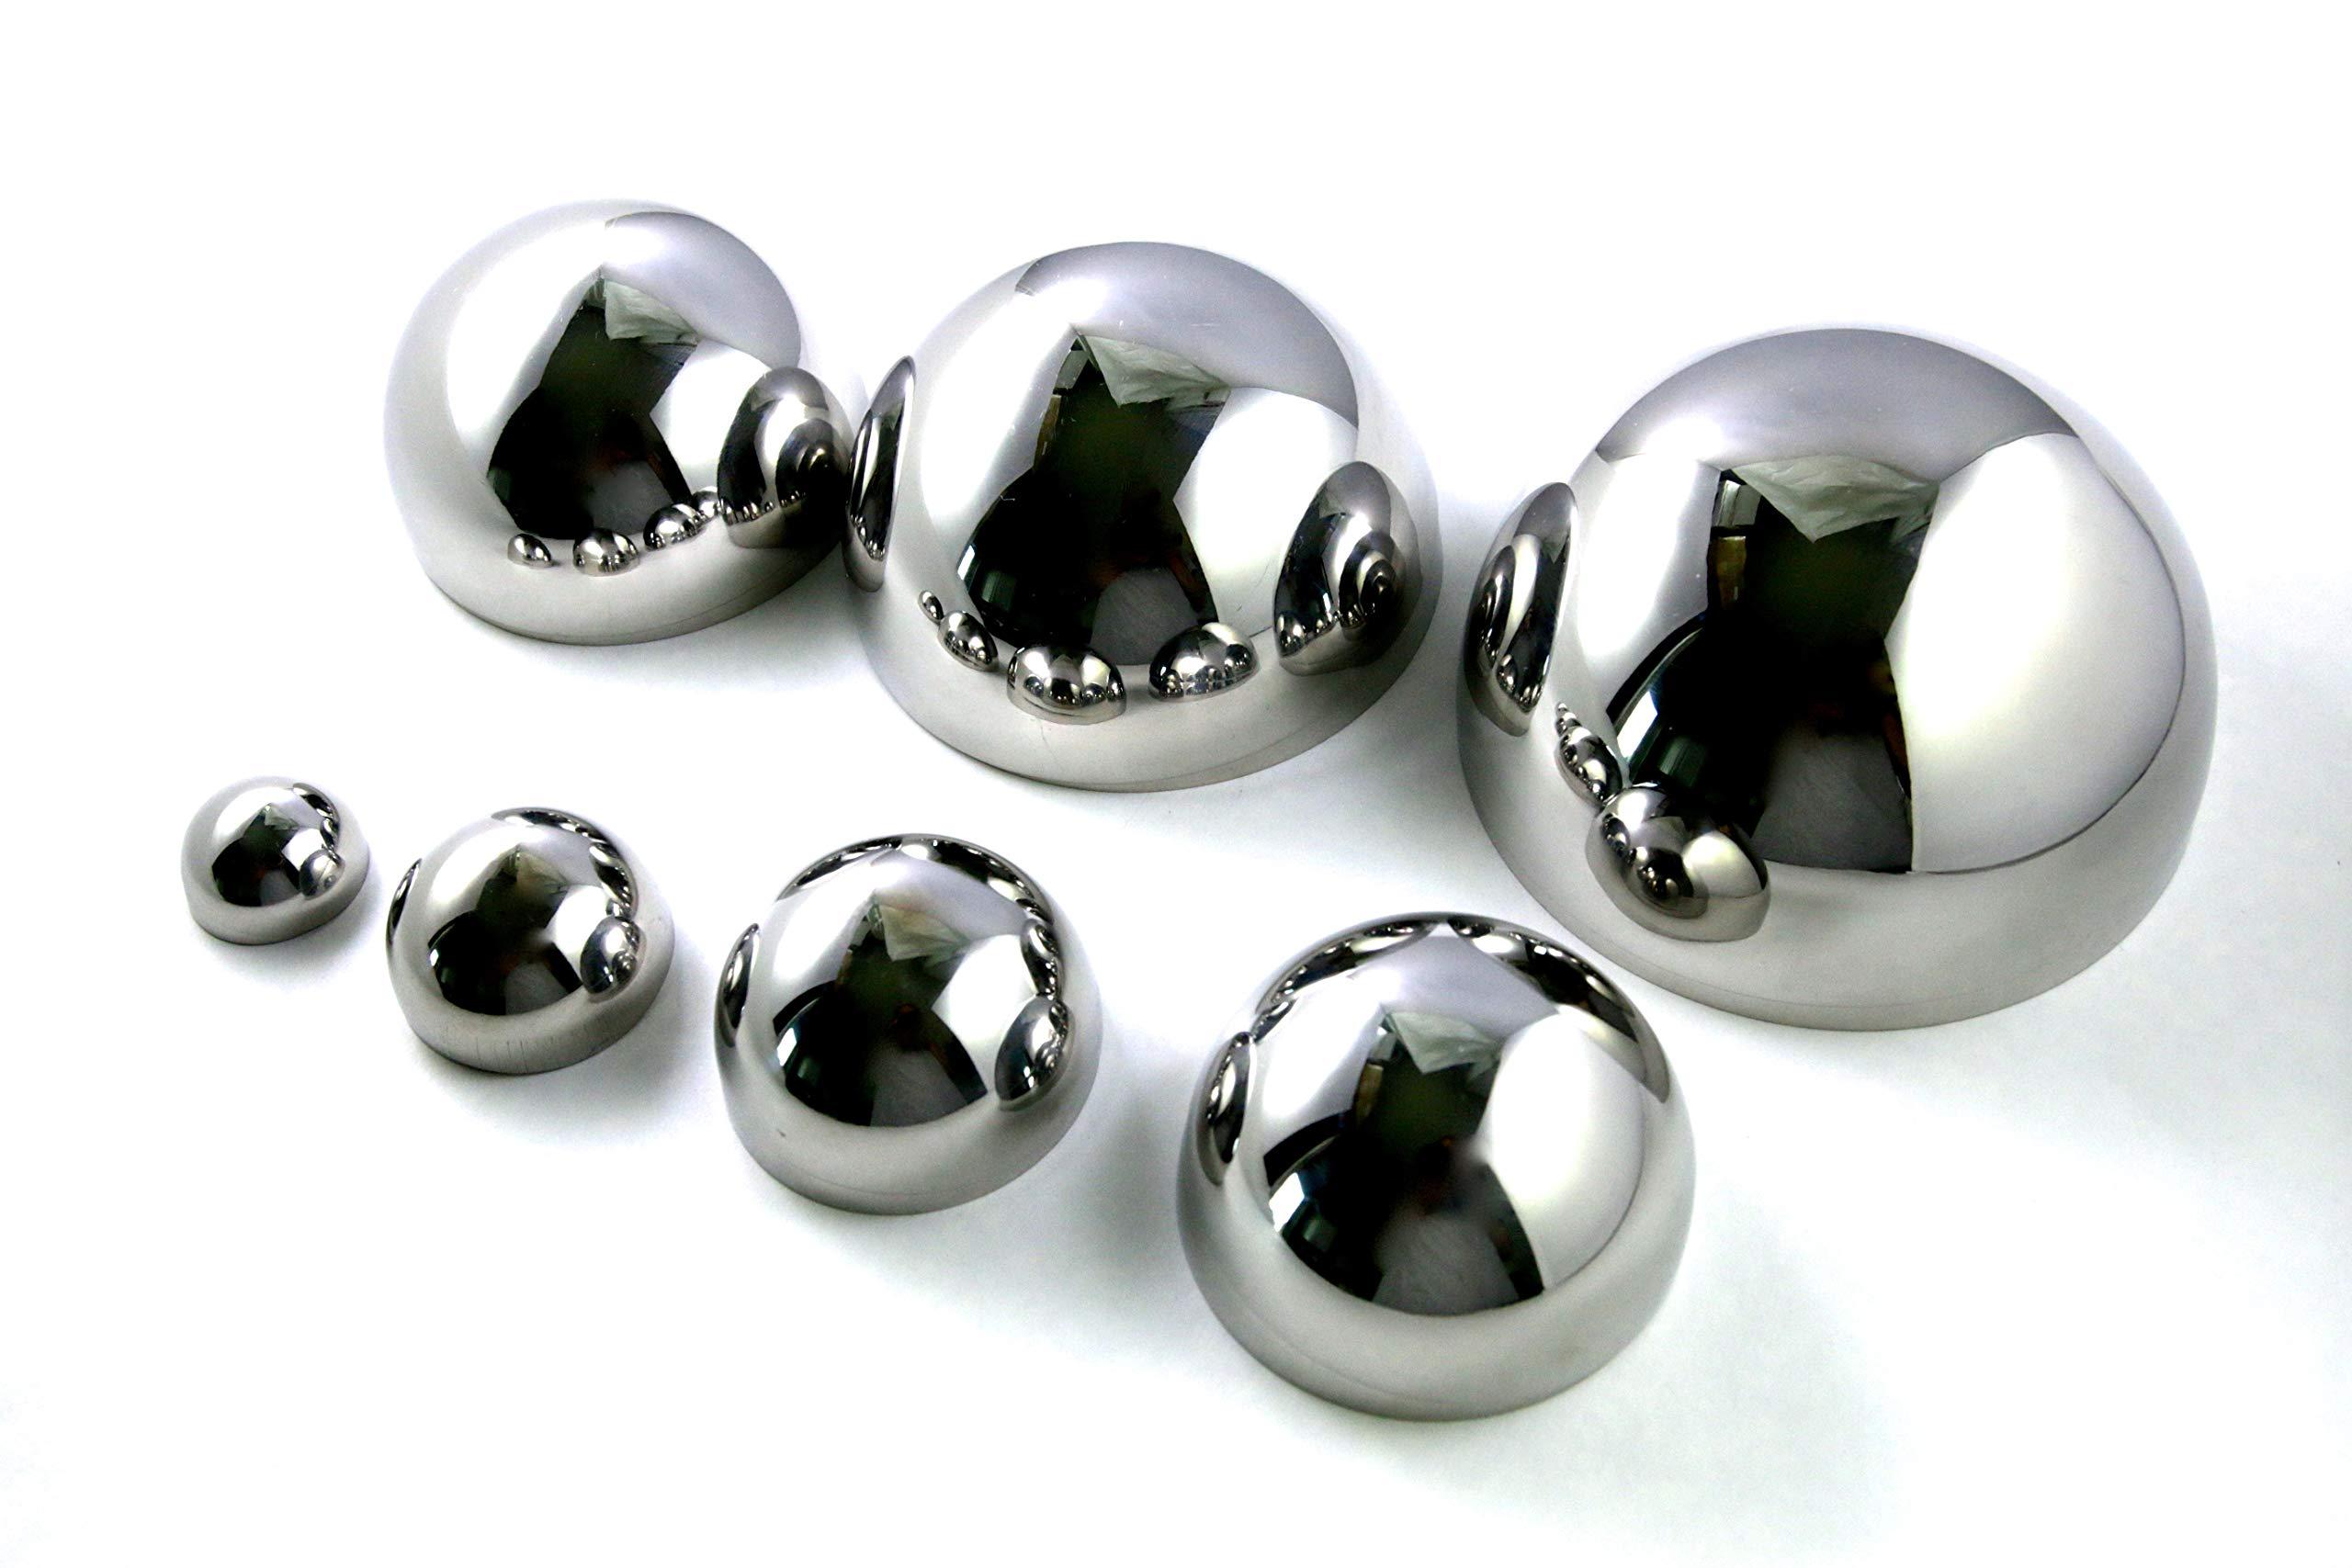 Lucky Seven Bath Bomb Mold Set, 7 Sizes (1.0'', 1.5'', 2.0'', 2.5'', 3.0'', 3.5'', 4.0'') Heavy Duty Stainless Steel, Won't Dent